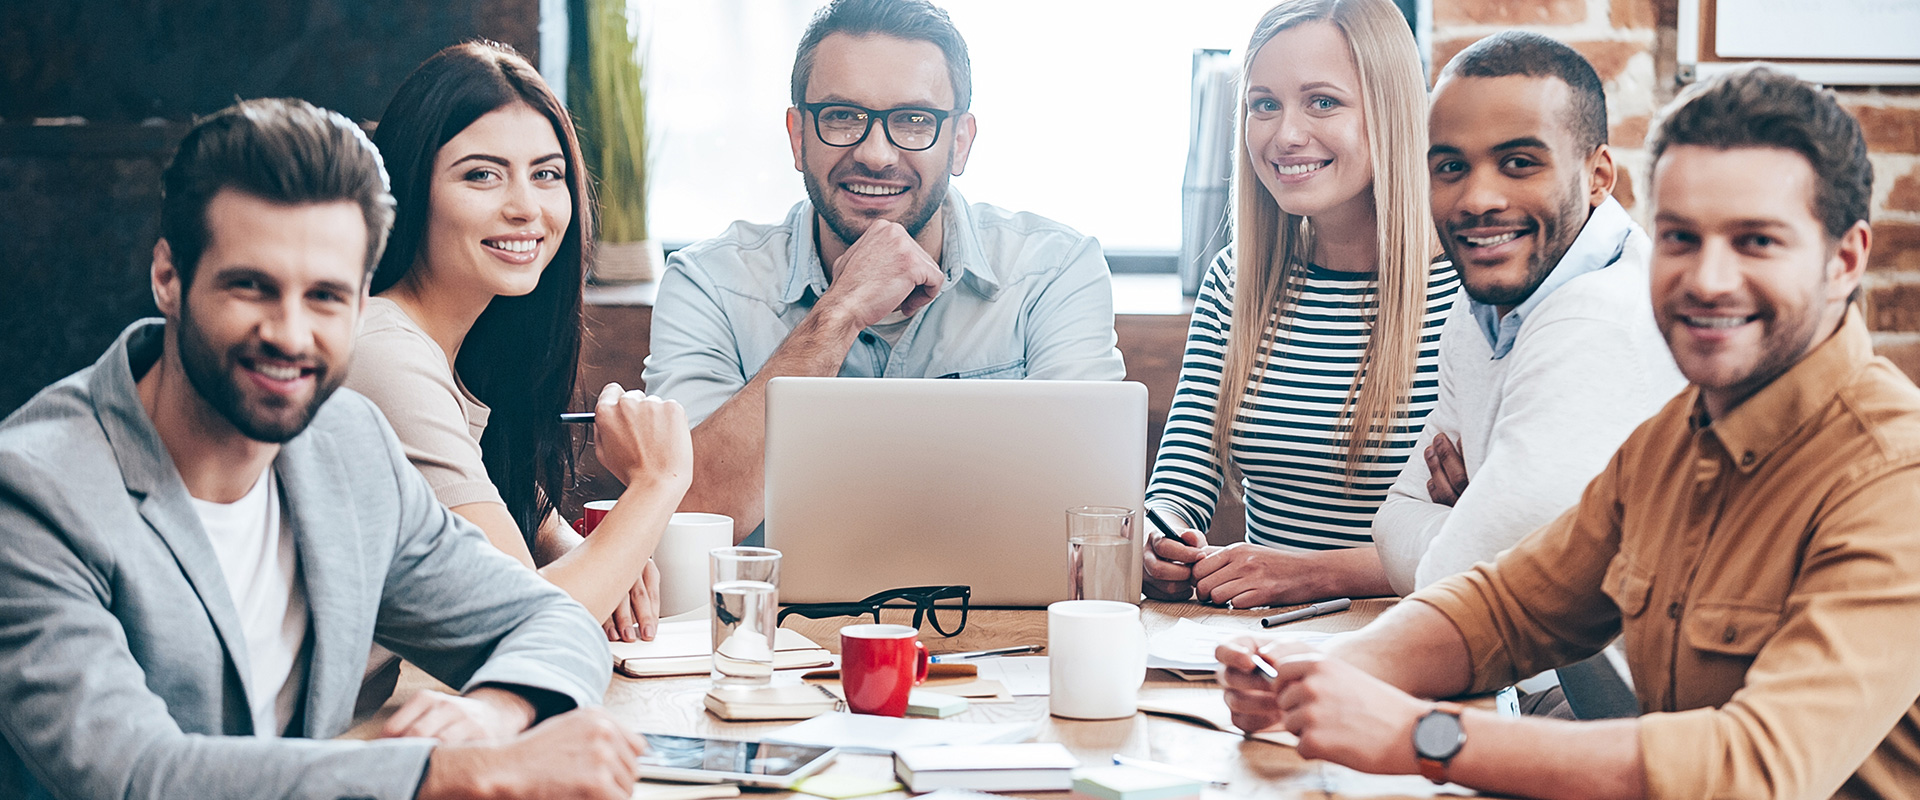 Blog: Si buscas empleo, ¡Aprovecha enero ! | Mandomedio.com